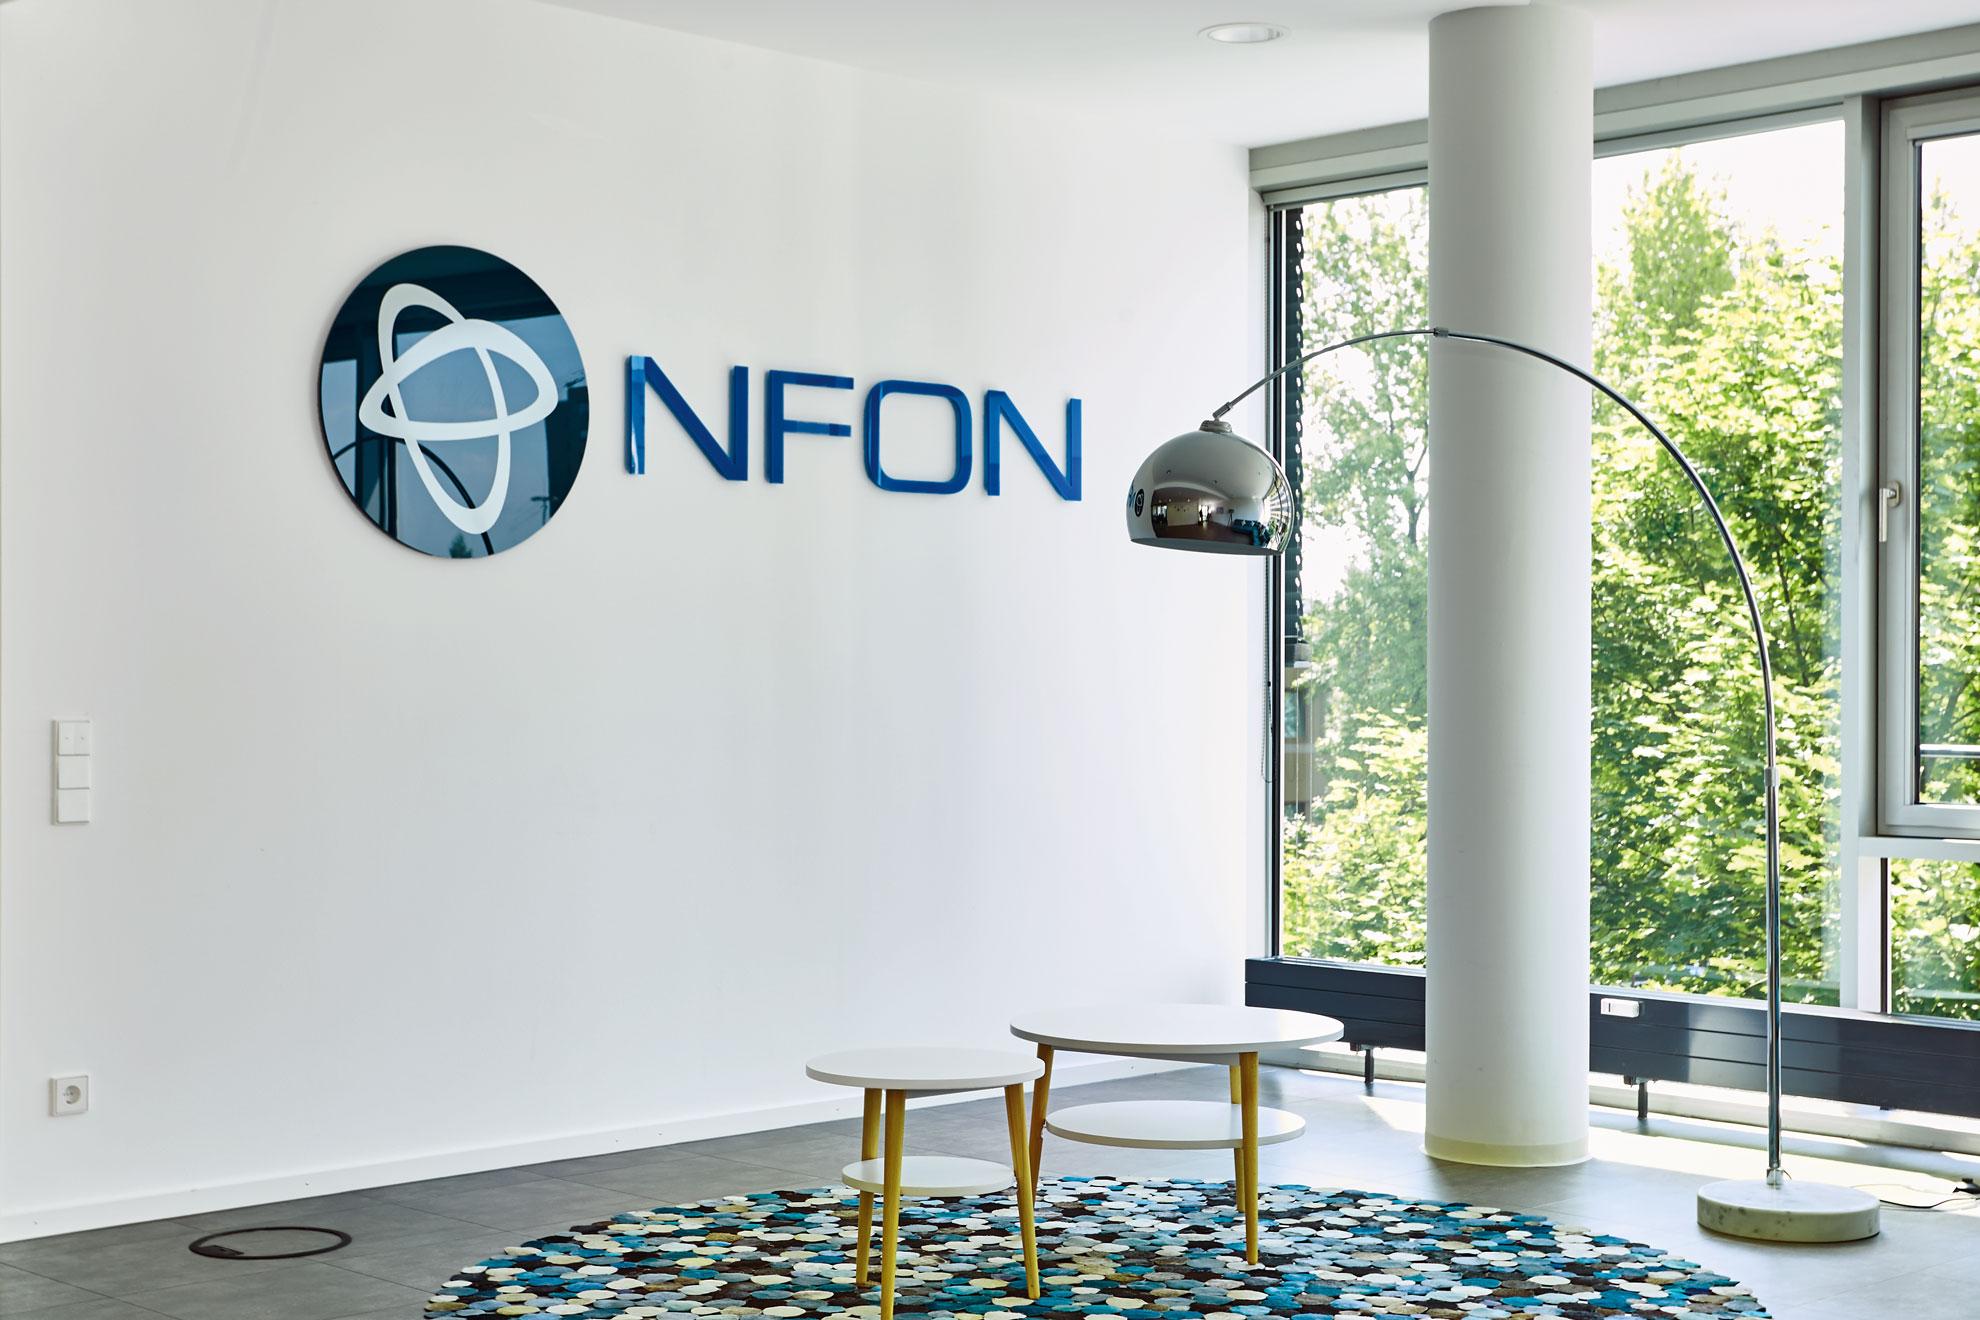 tm_IP_NFON01